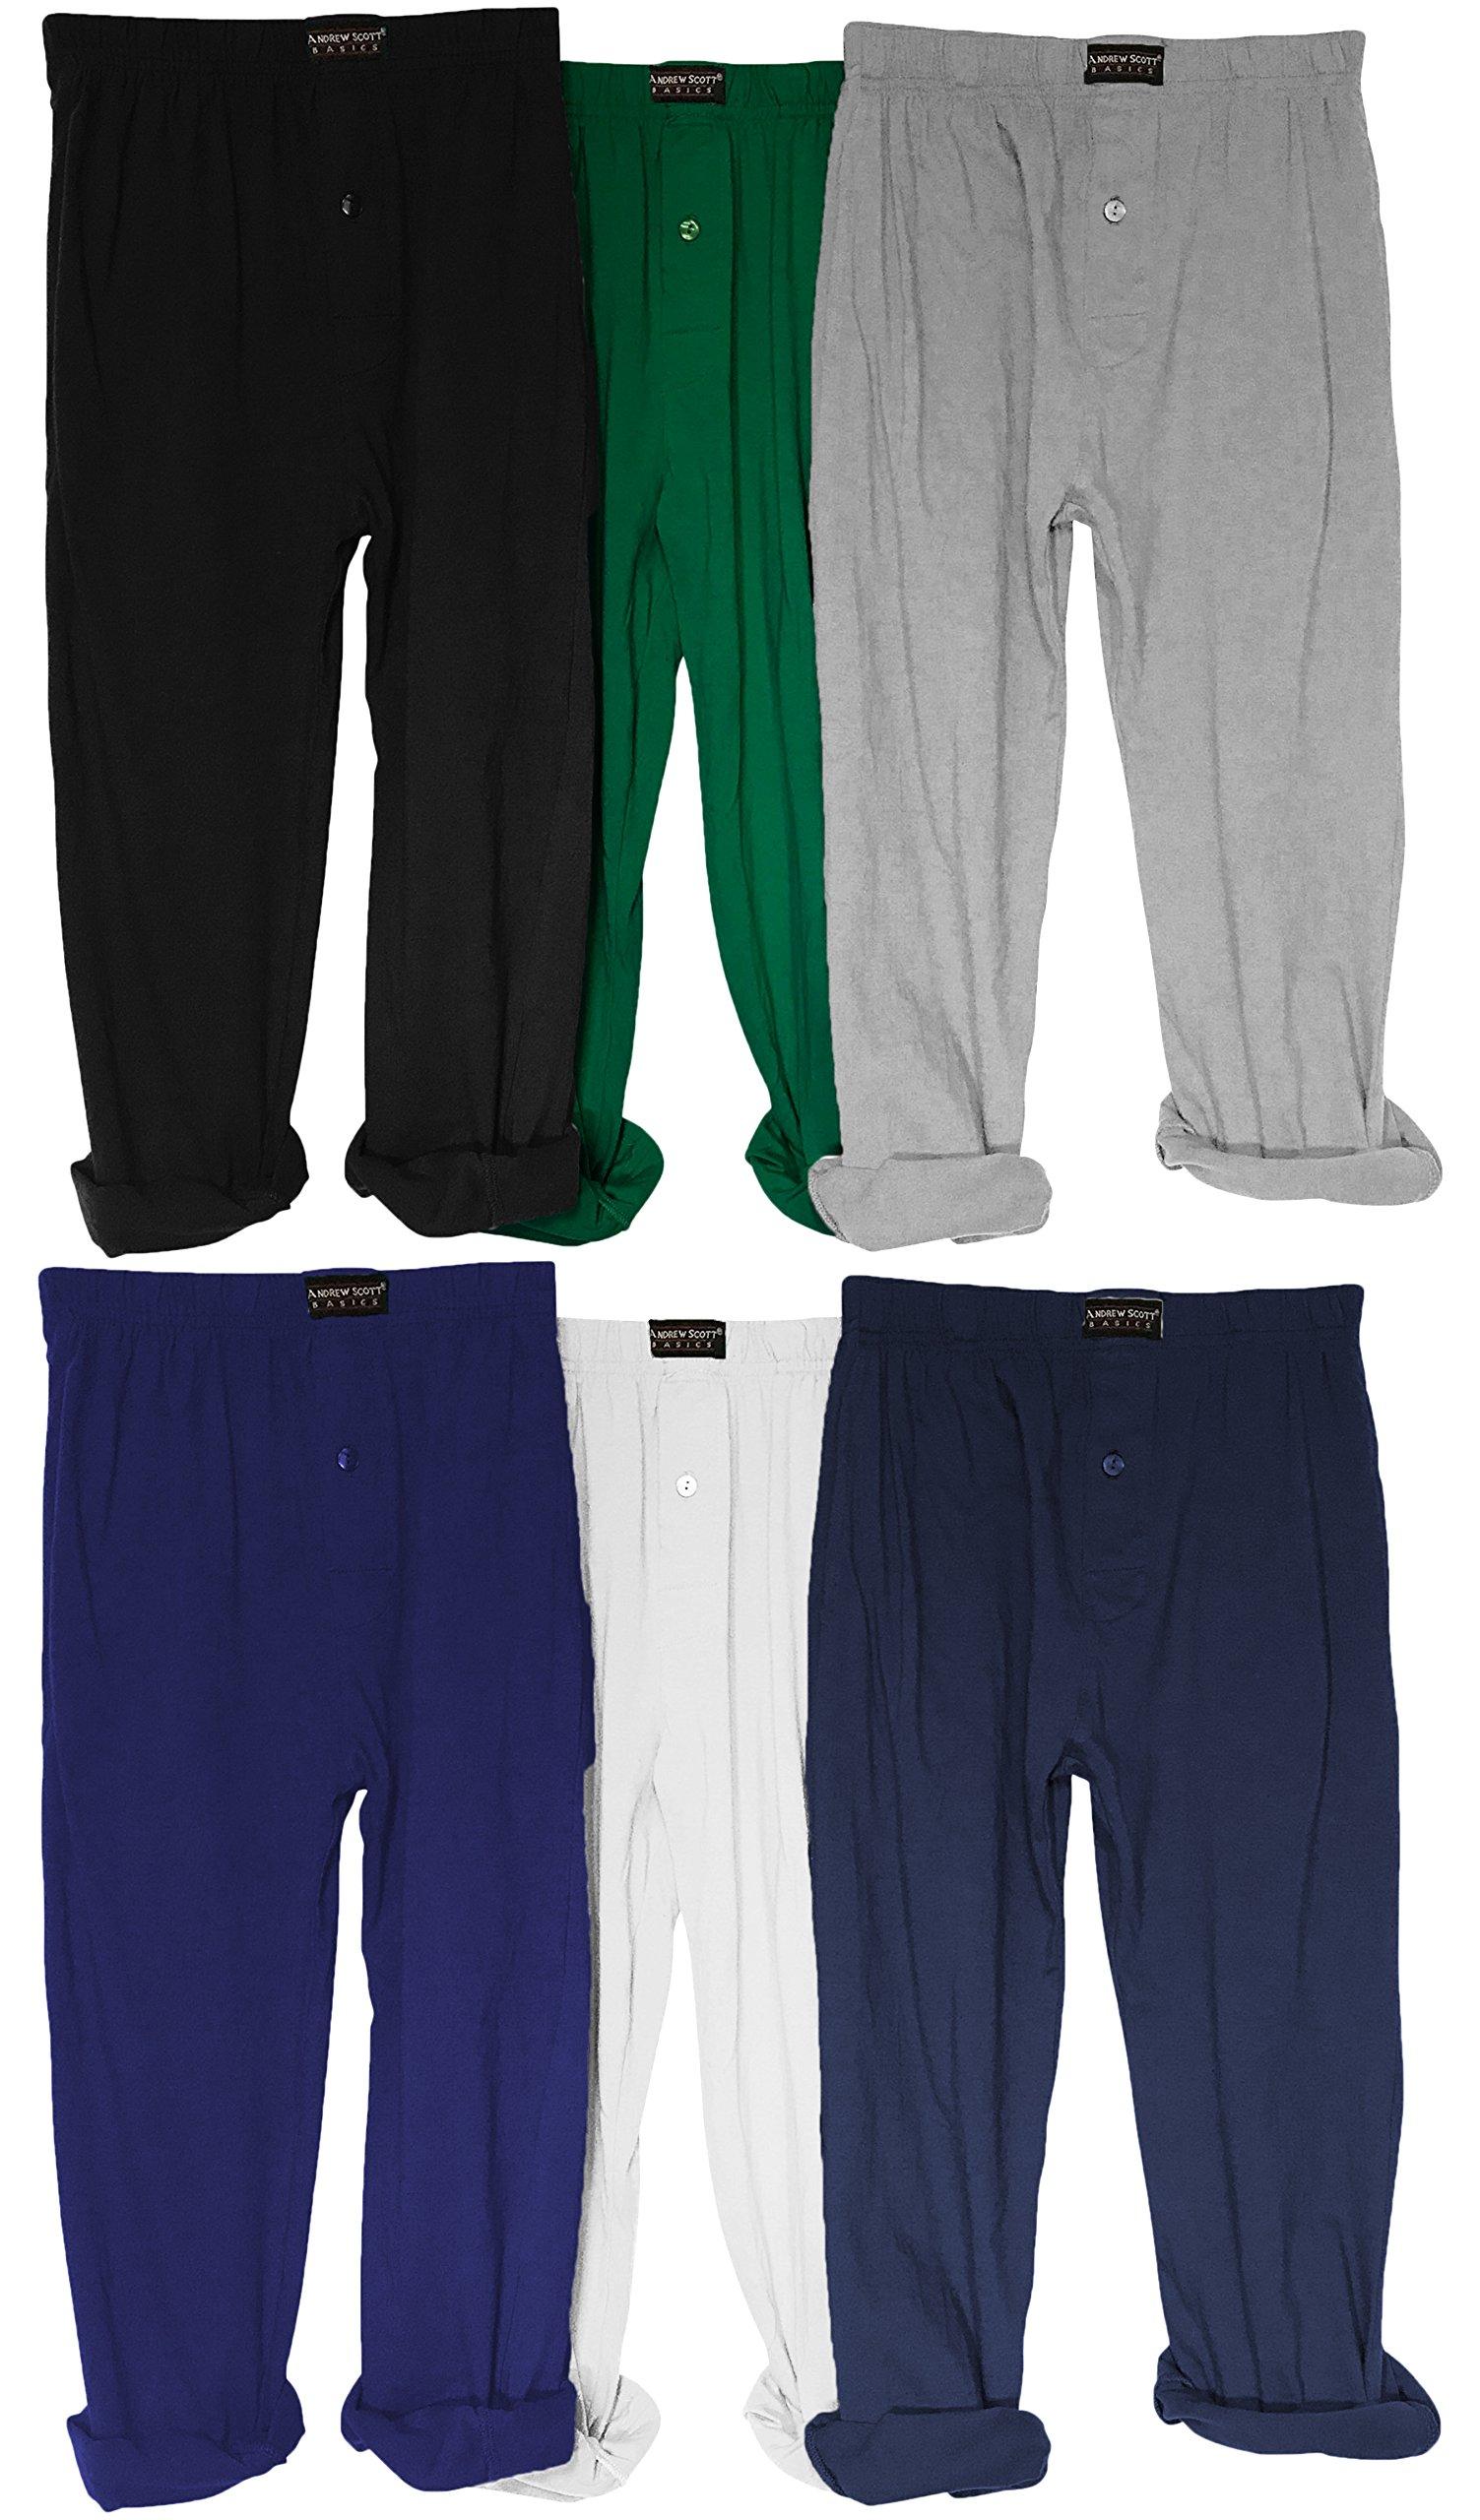 Andrew Scott Boy's 3 Pack Jersey Knit Soft & Light Active Yoga/Beach Pants (Medium, 6 Pack - Black Navy White Royal Hunter Grey)